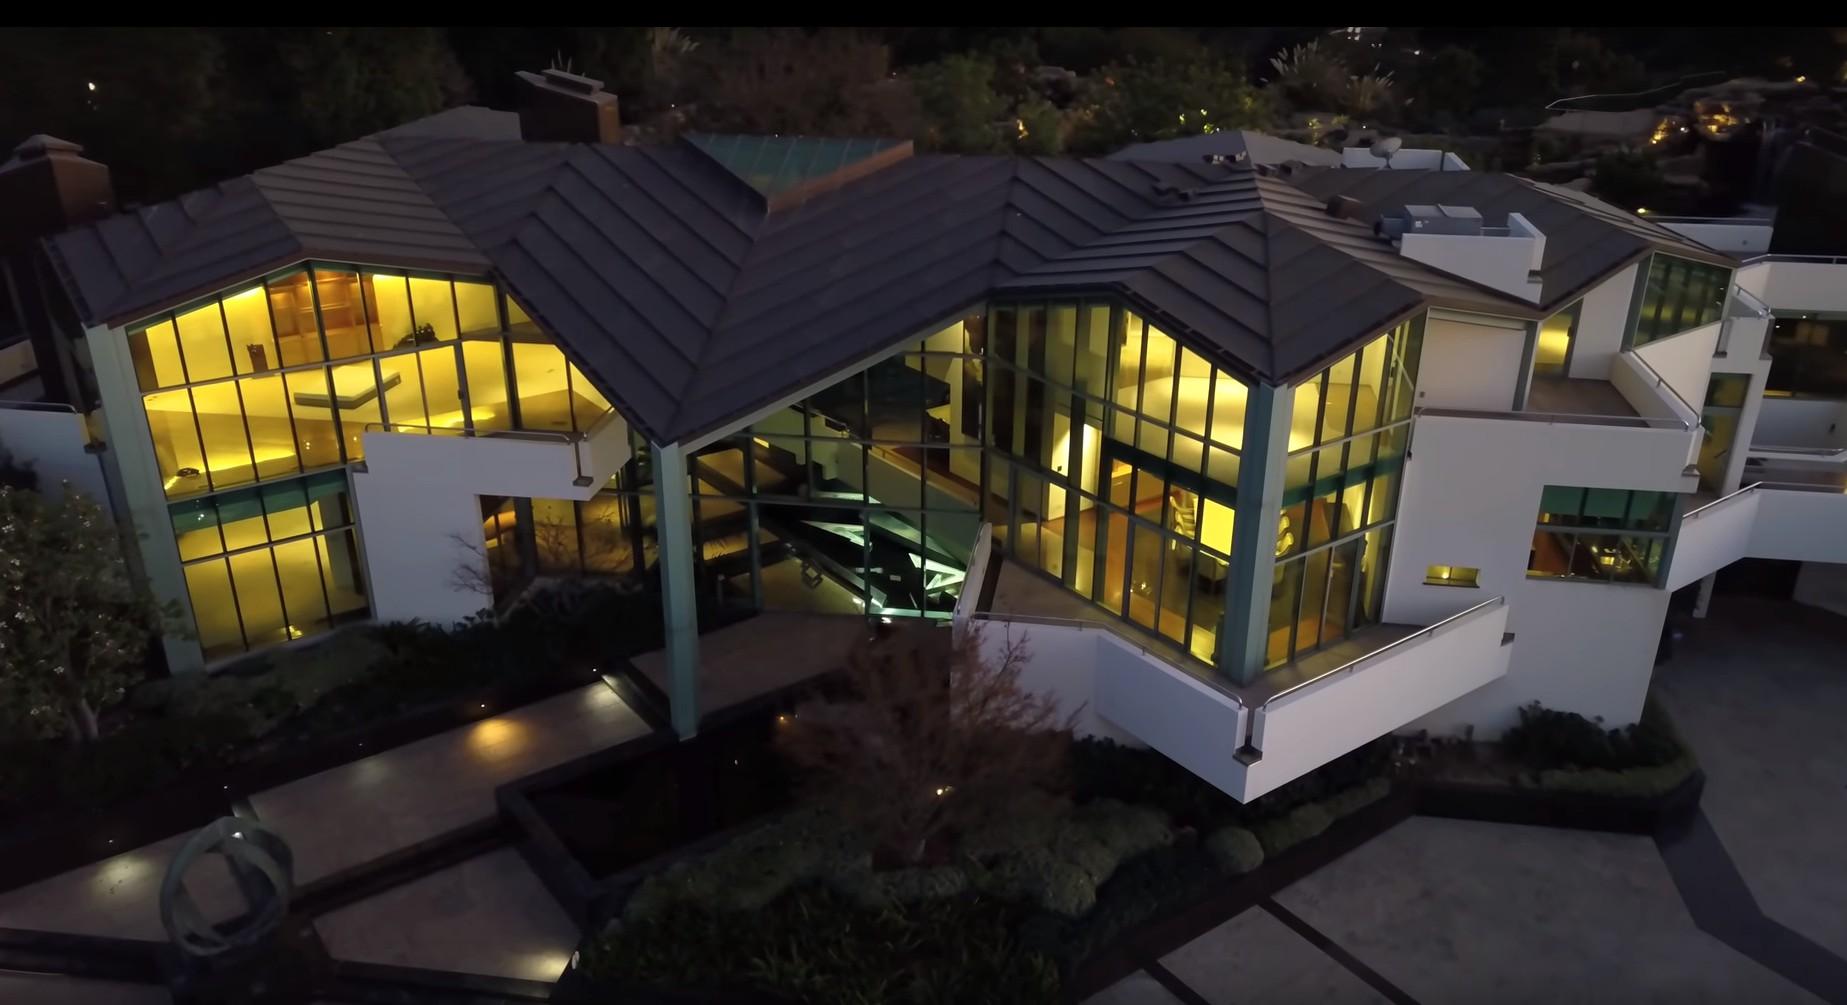 Pharrell Williams' roof